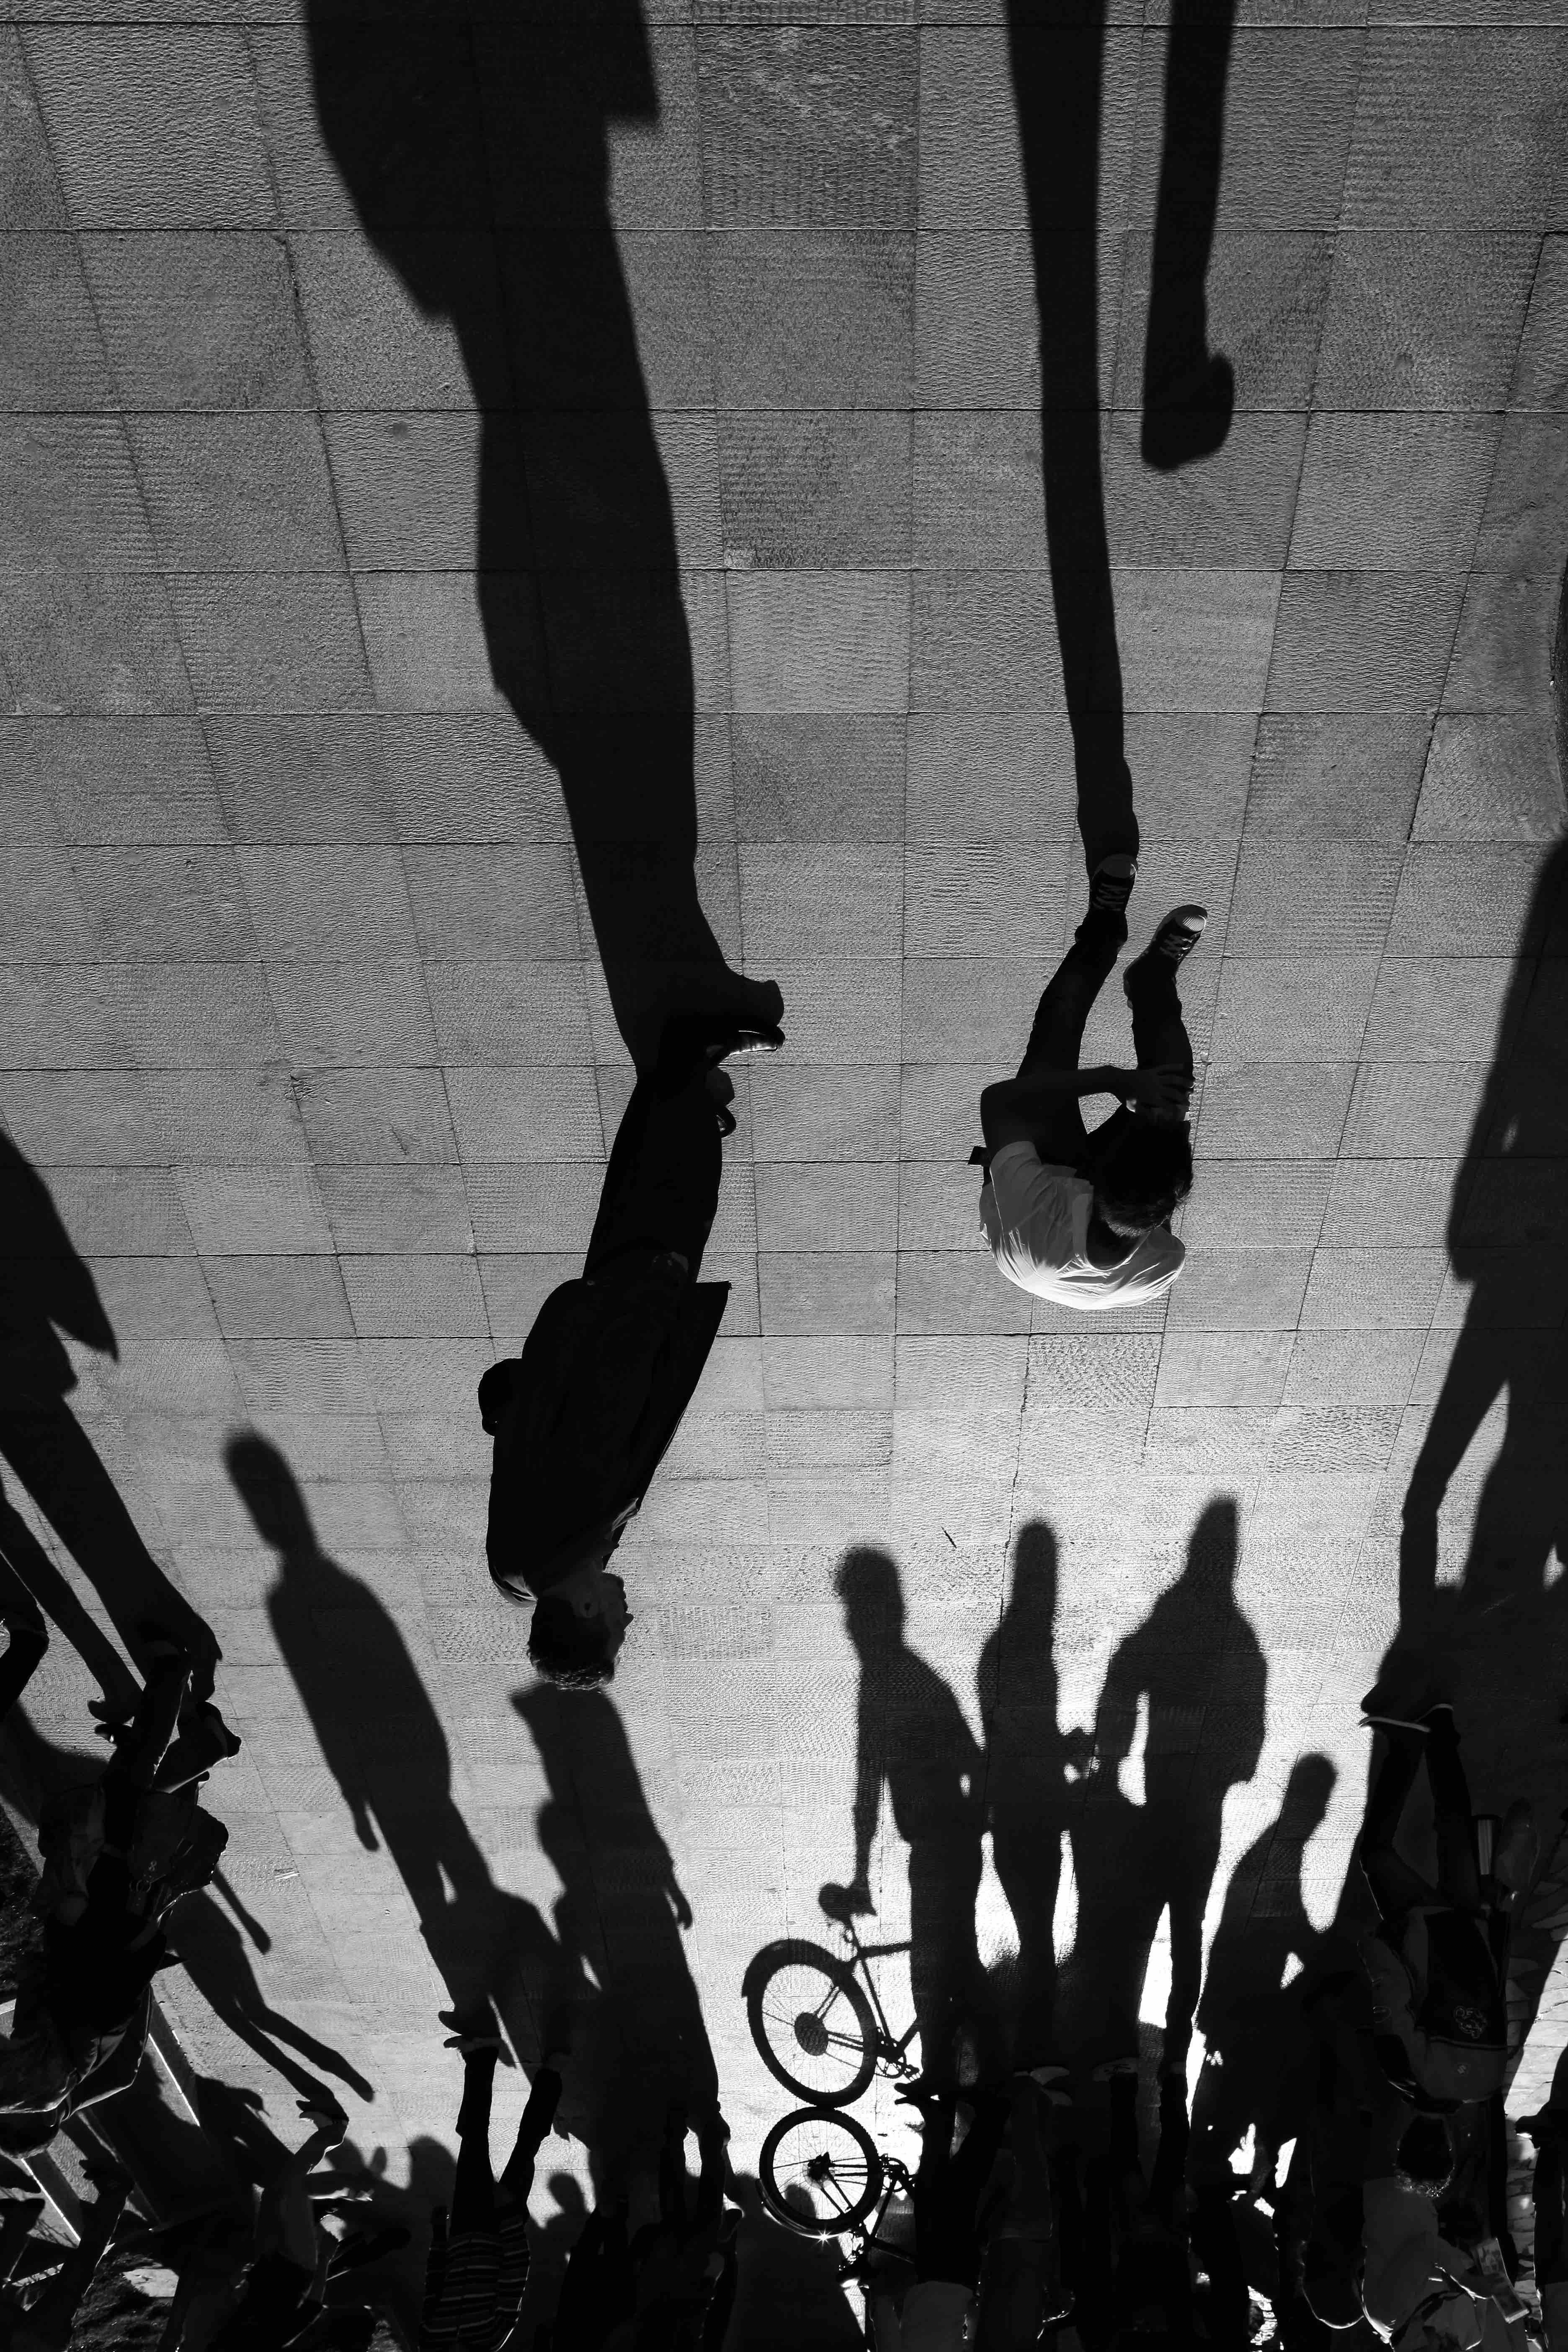 Untitled (17)_ The Life Of Shadows Series - Nehdaran_ Dana